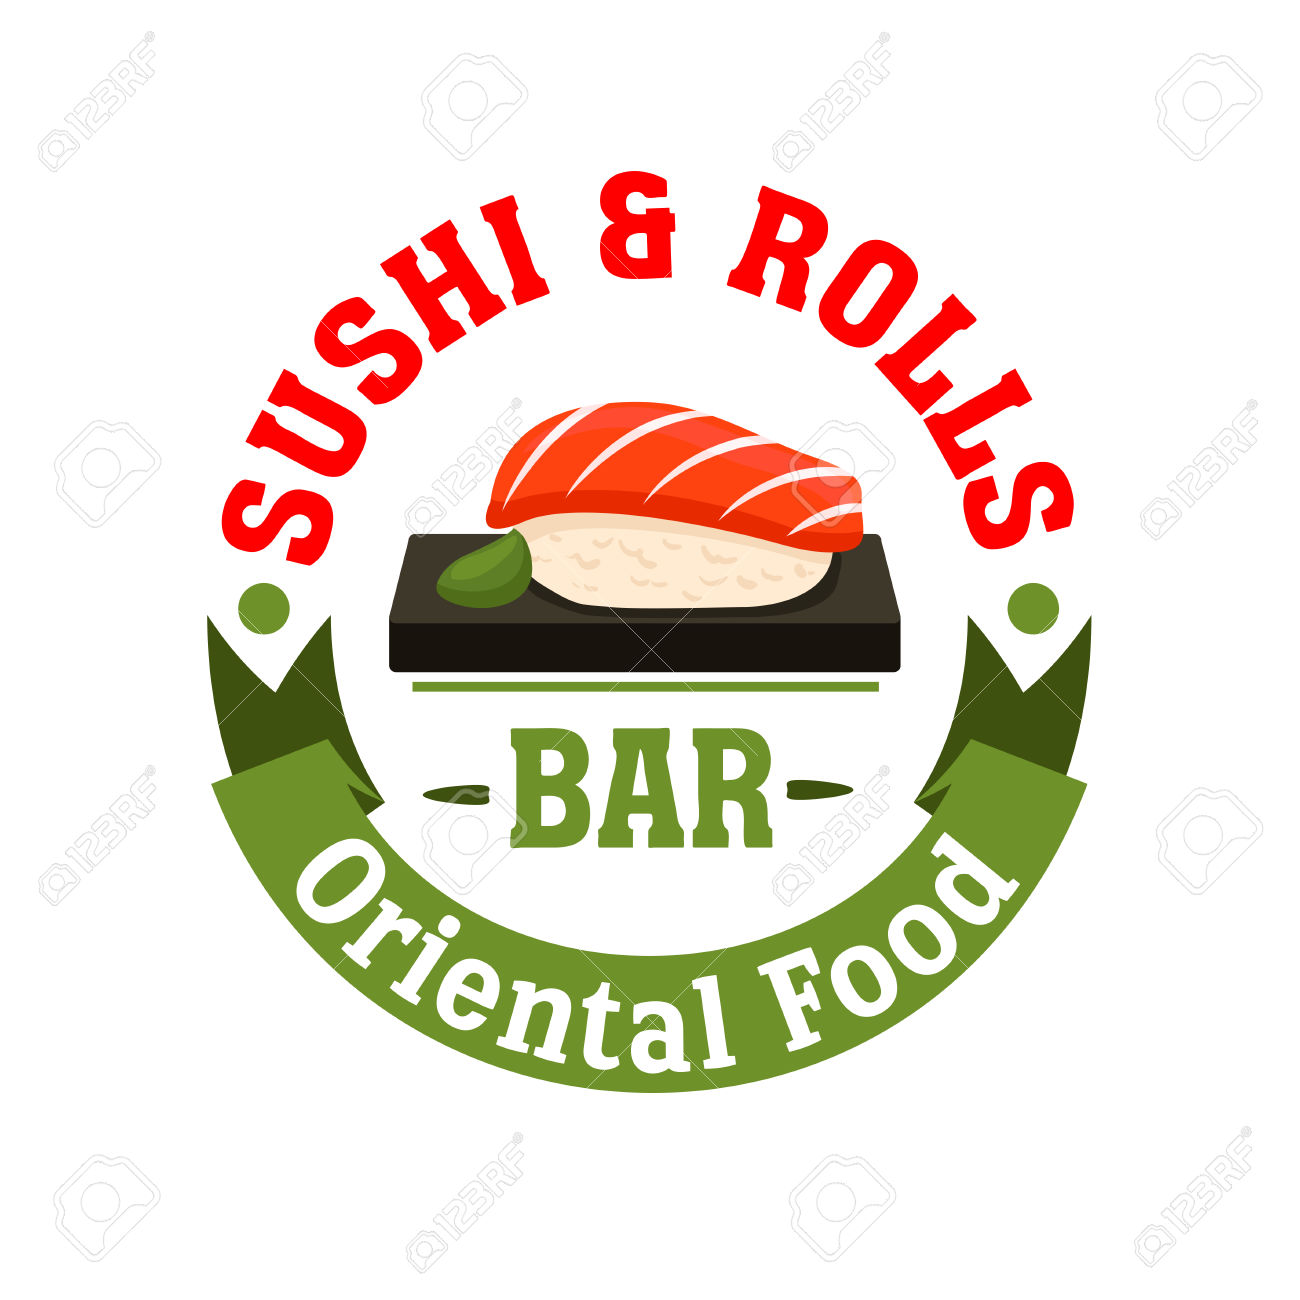 Sushi And Rolls Bar Icon. Japanese Food Restaurant Emblem. Seafood.